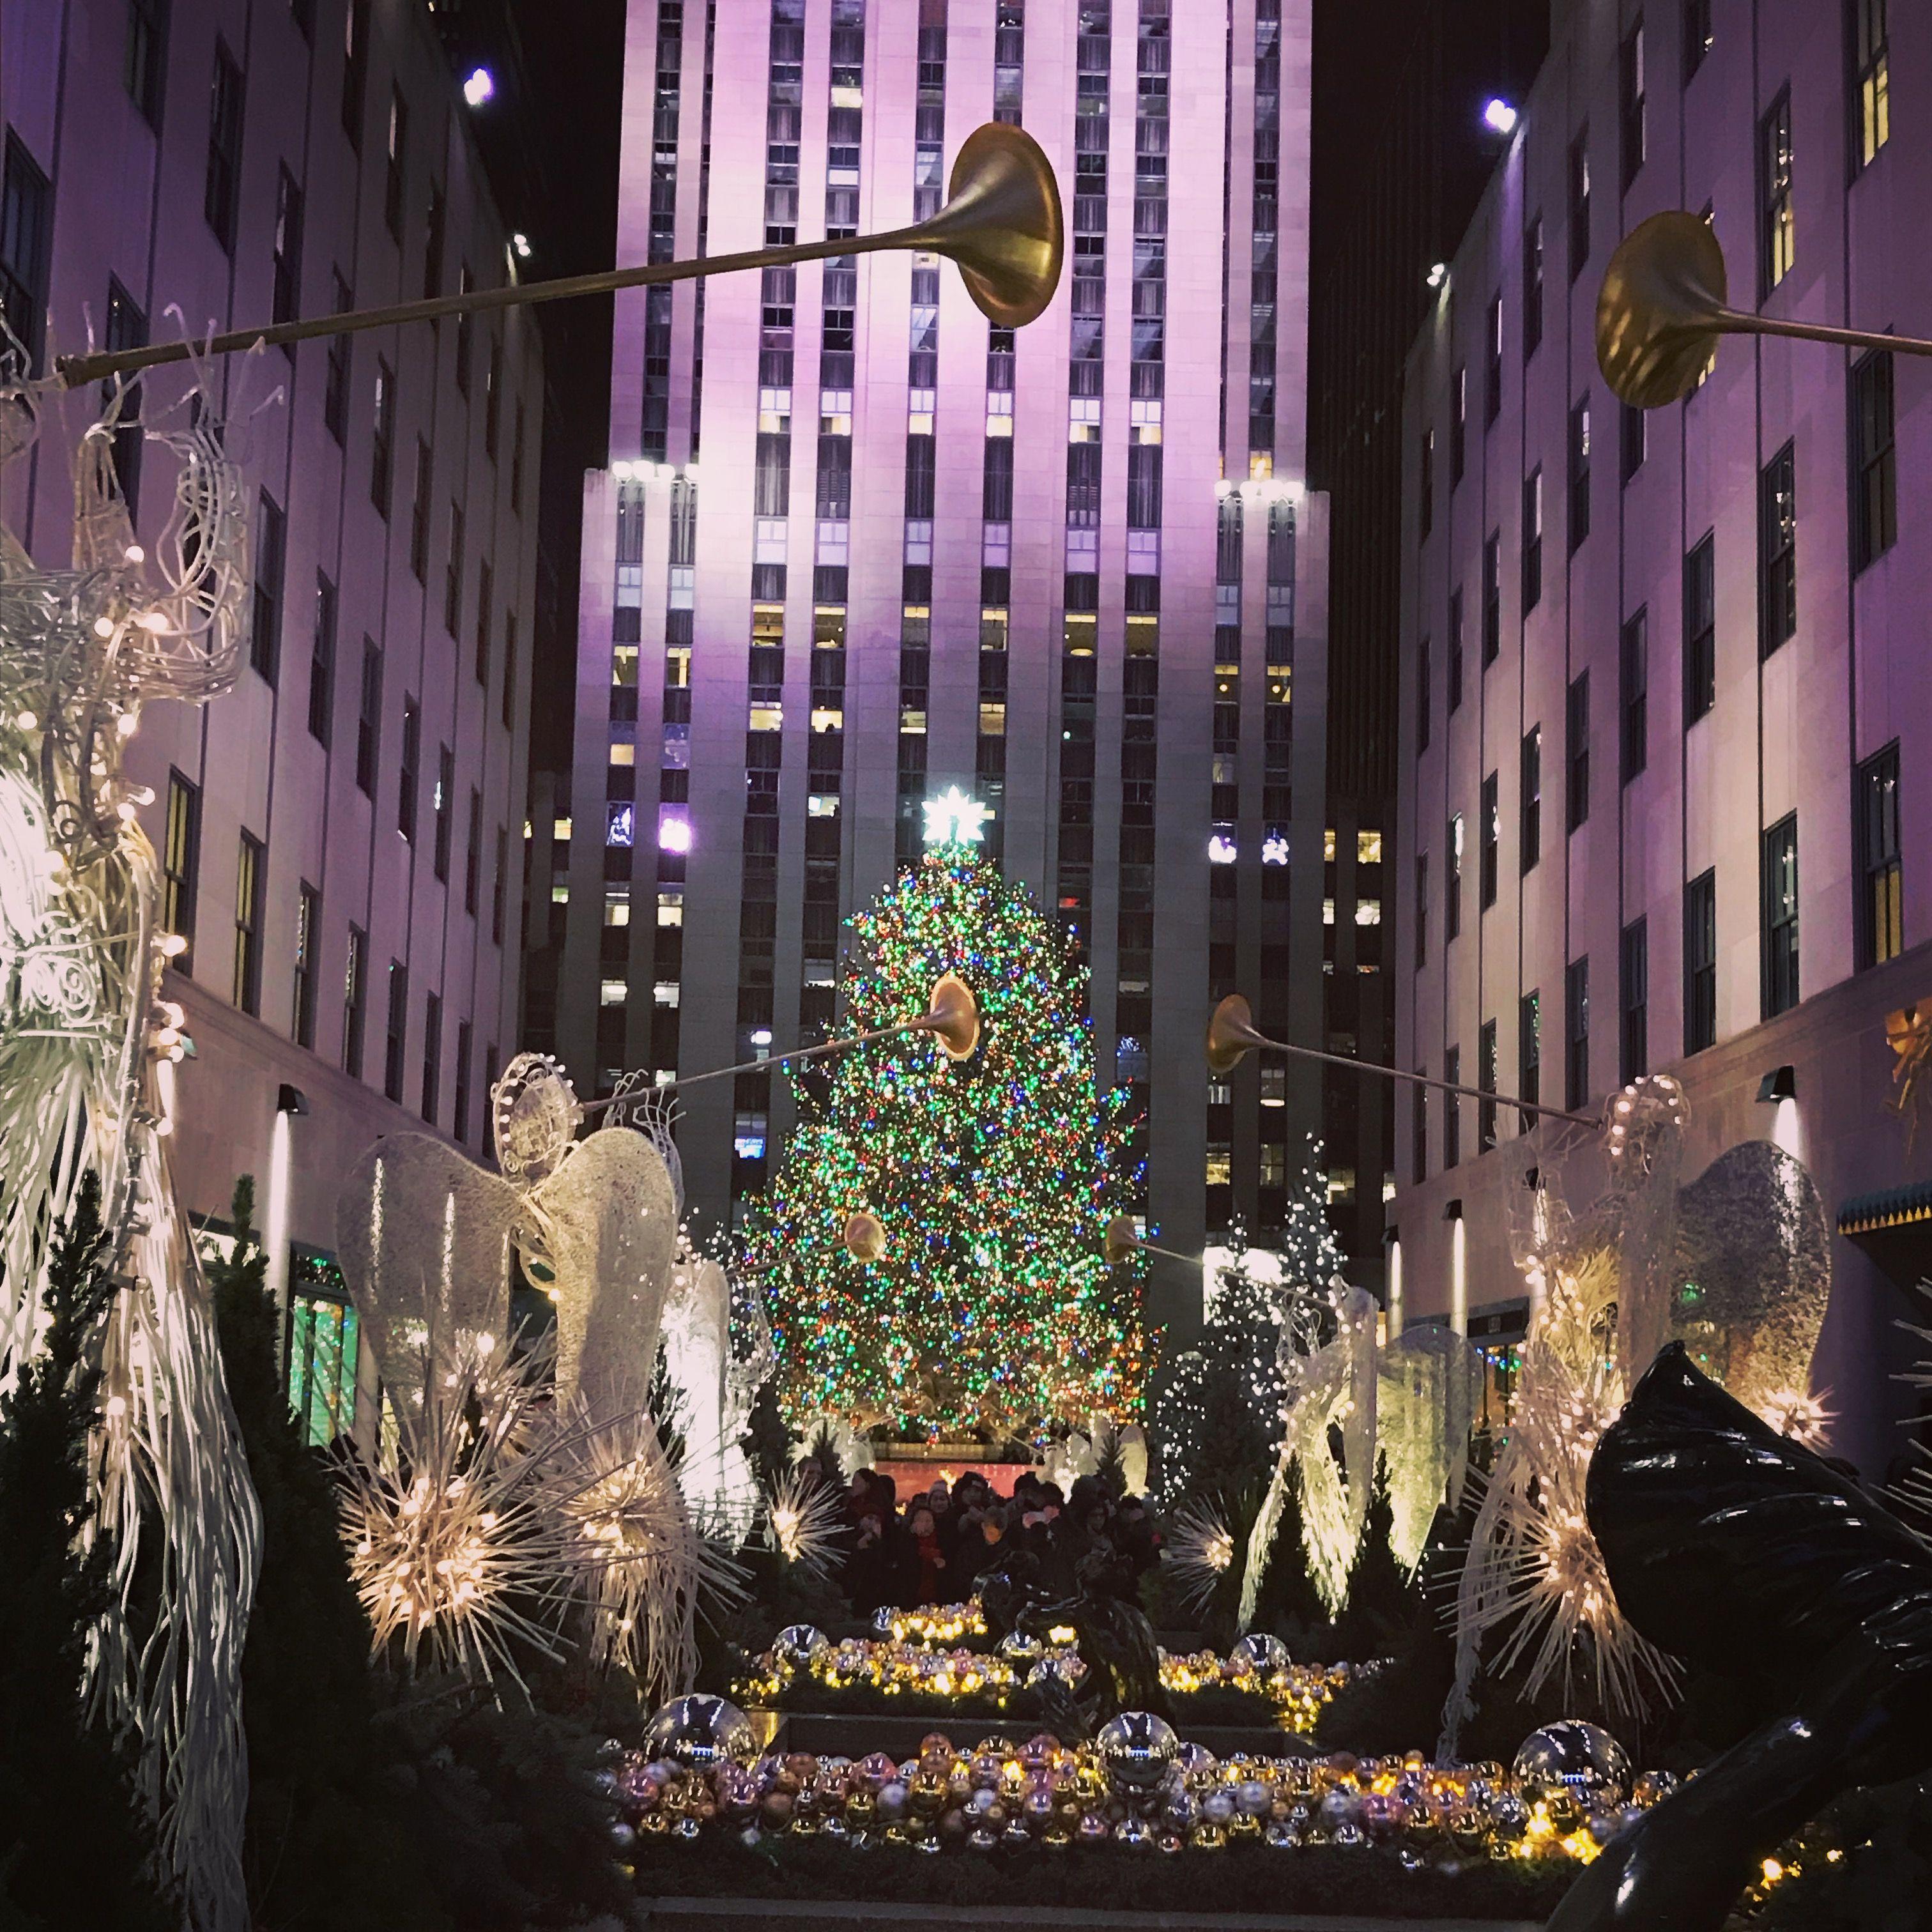 #christmasinnewyork #newyorkcity #rockefellercenter #rockefellerchristmastree #christmastree